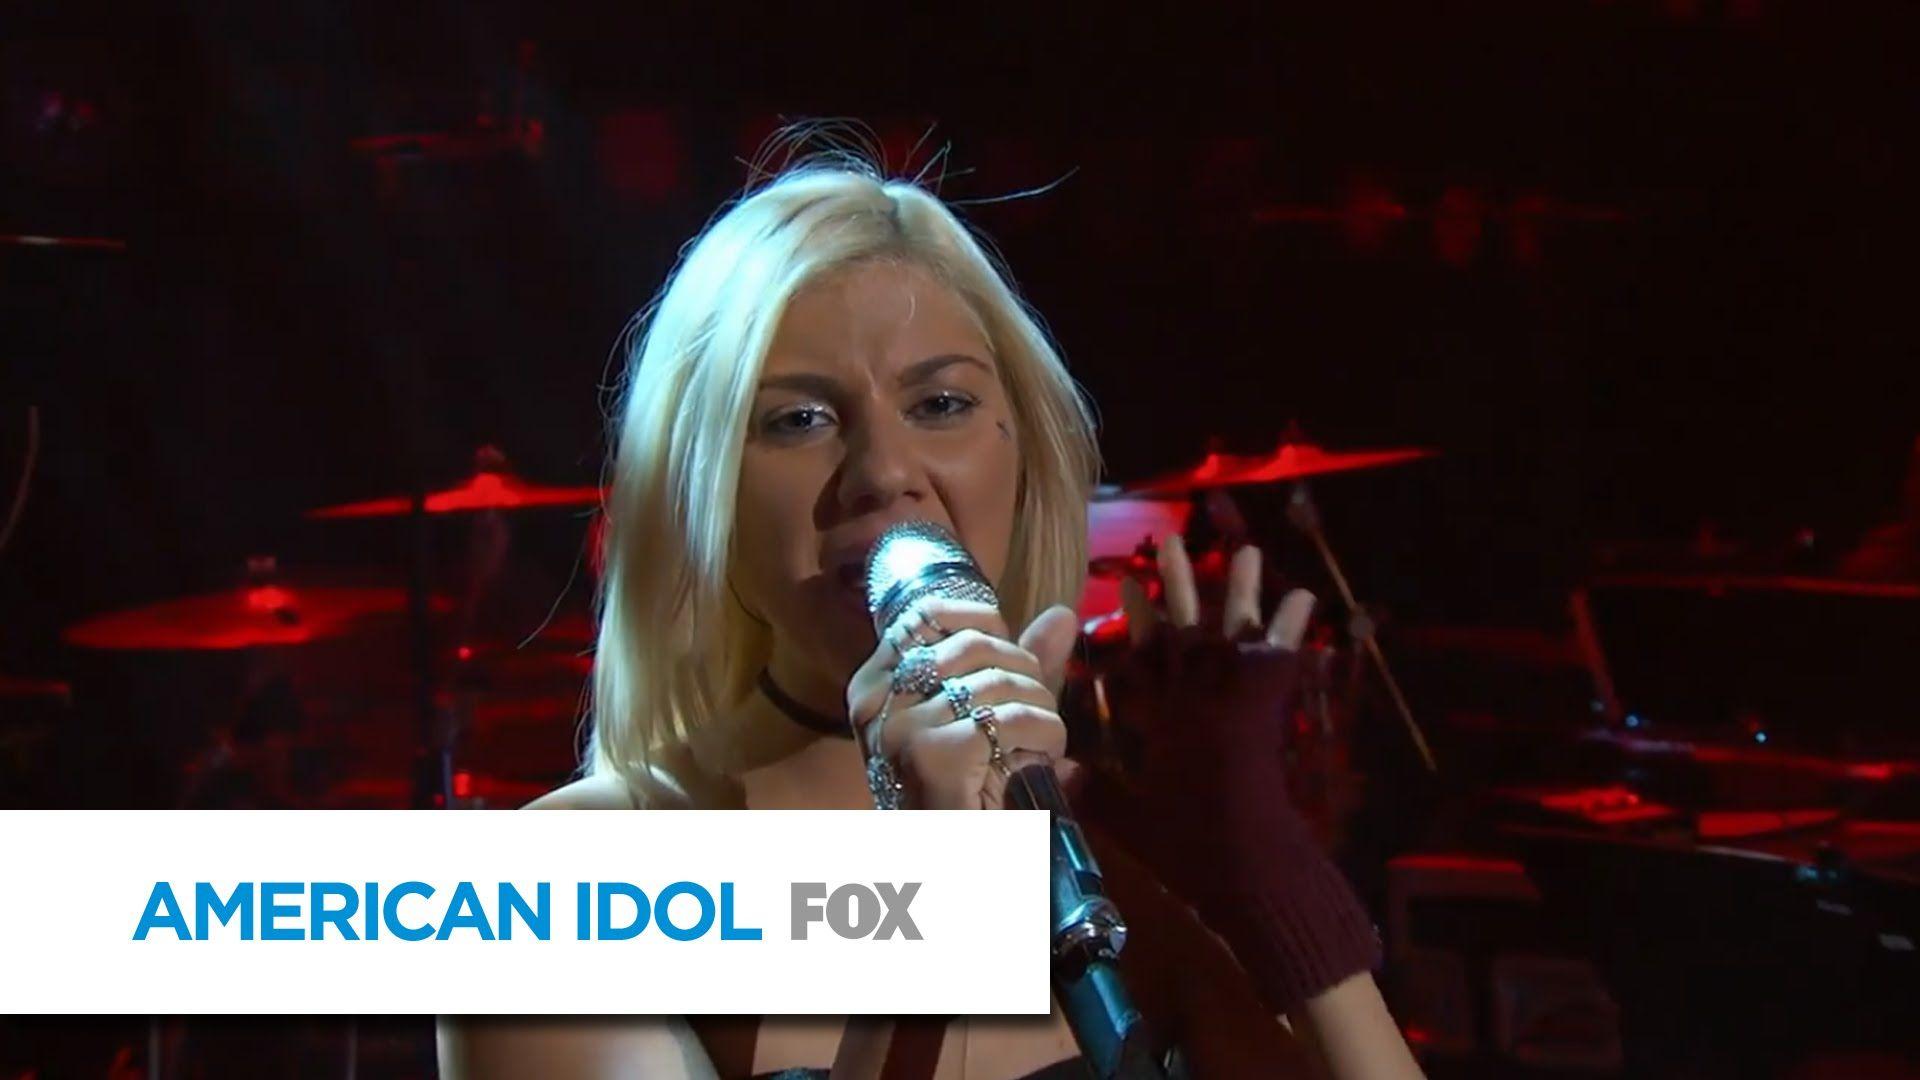 Top 12 Girls Jax American Idol Xiv Solitary Angel American